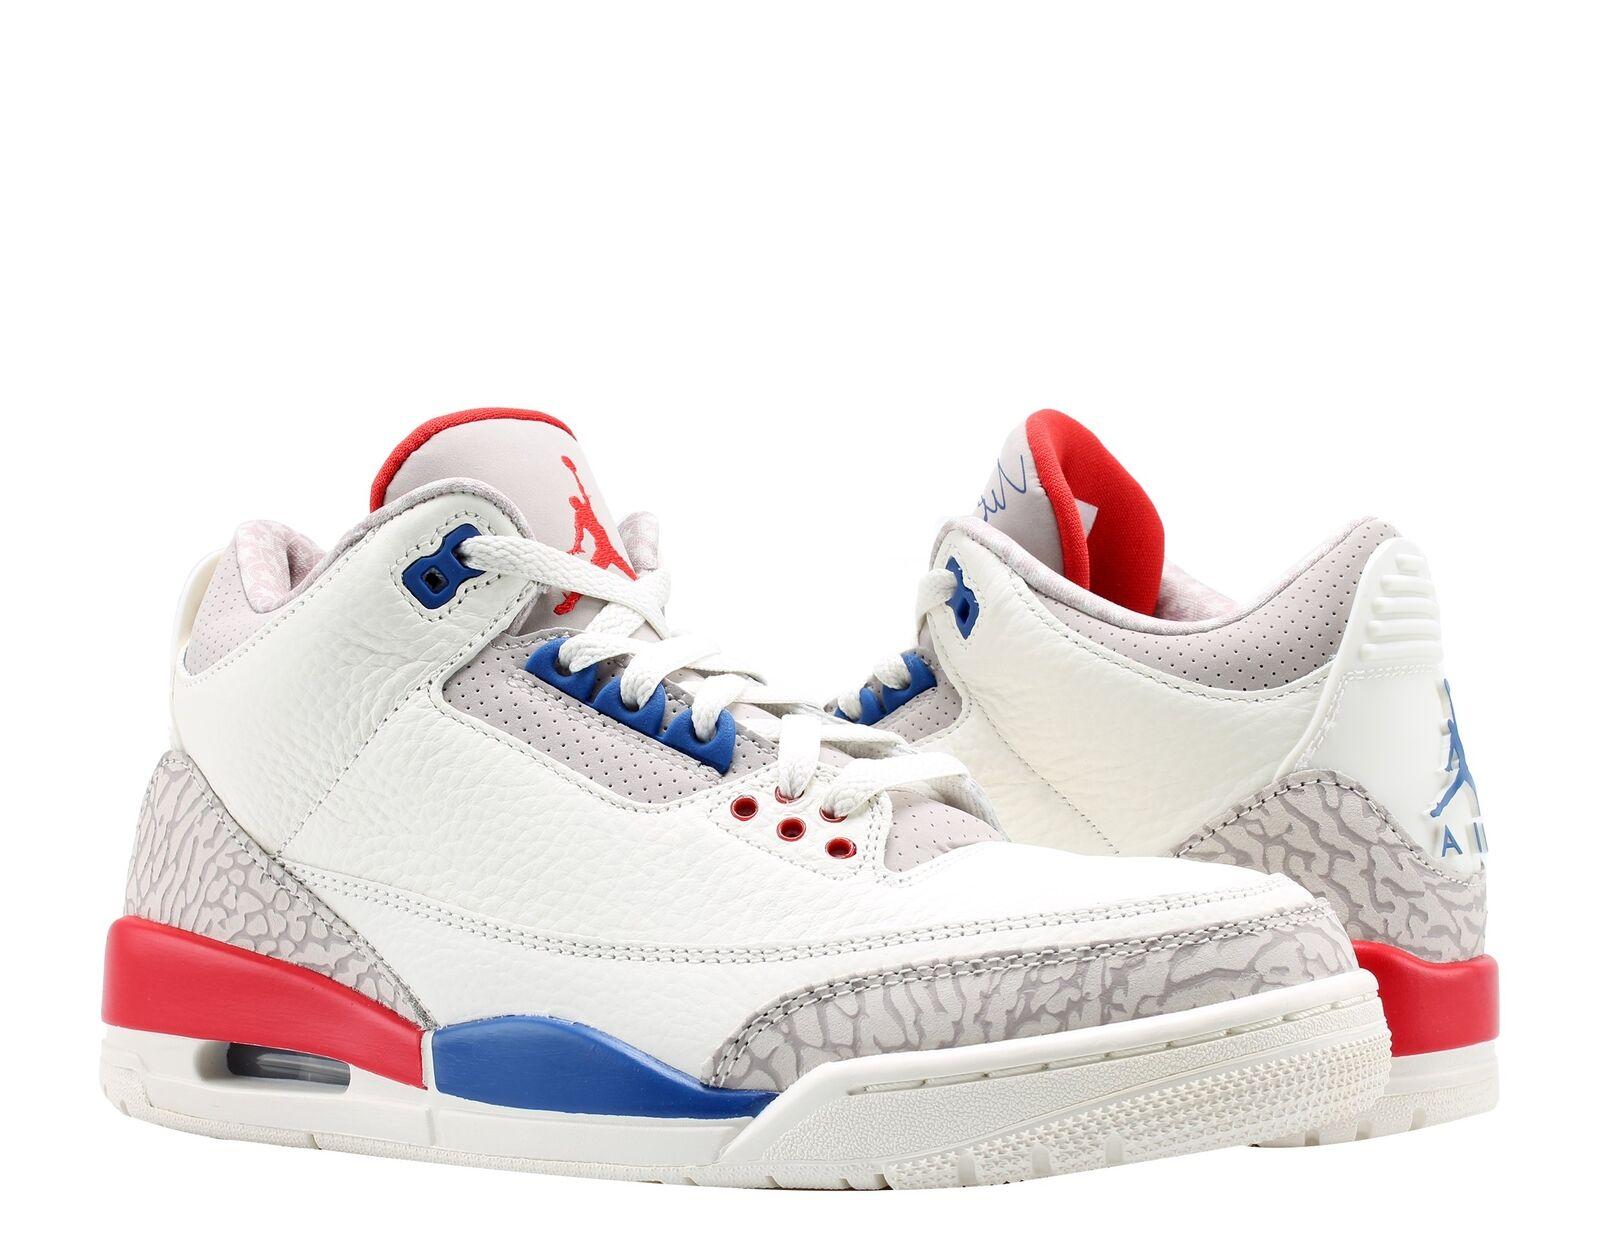 Nike air jordan vela 3 retrò internazionale vela jordan uomini scarpe da basket 136064-116 6a93b8